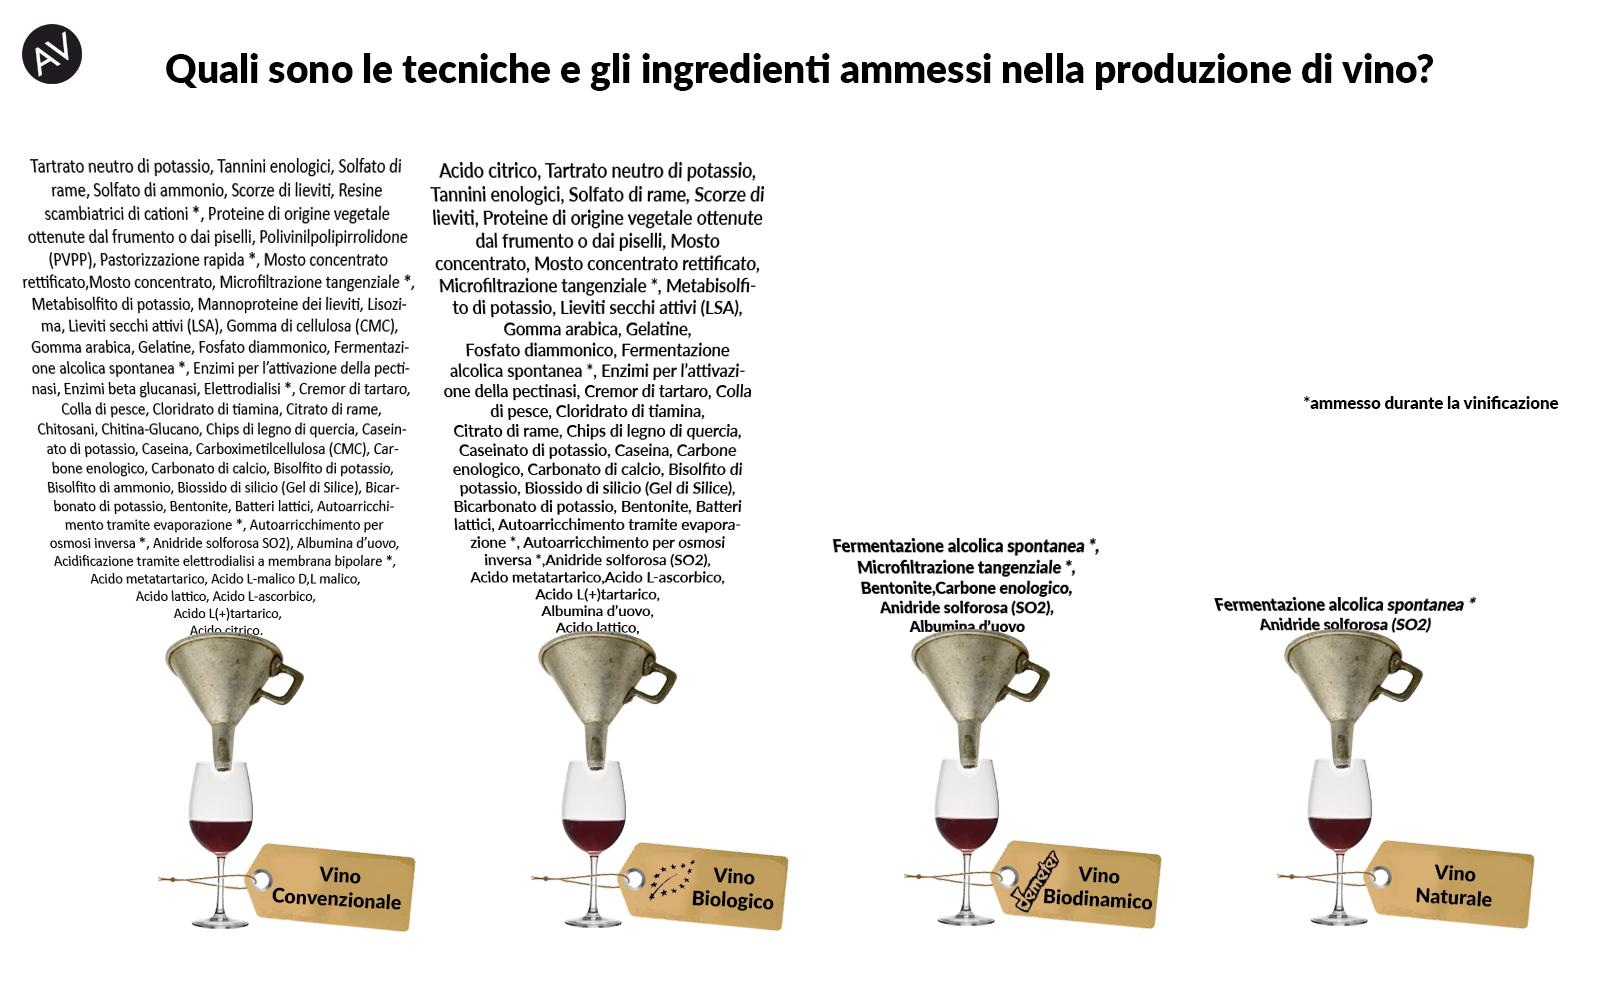 Biologico Biodinamico, Naturale Enoteca AssoVino